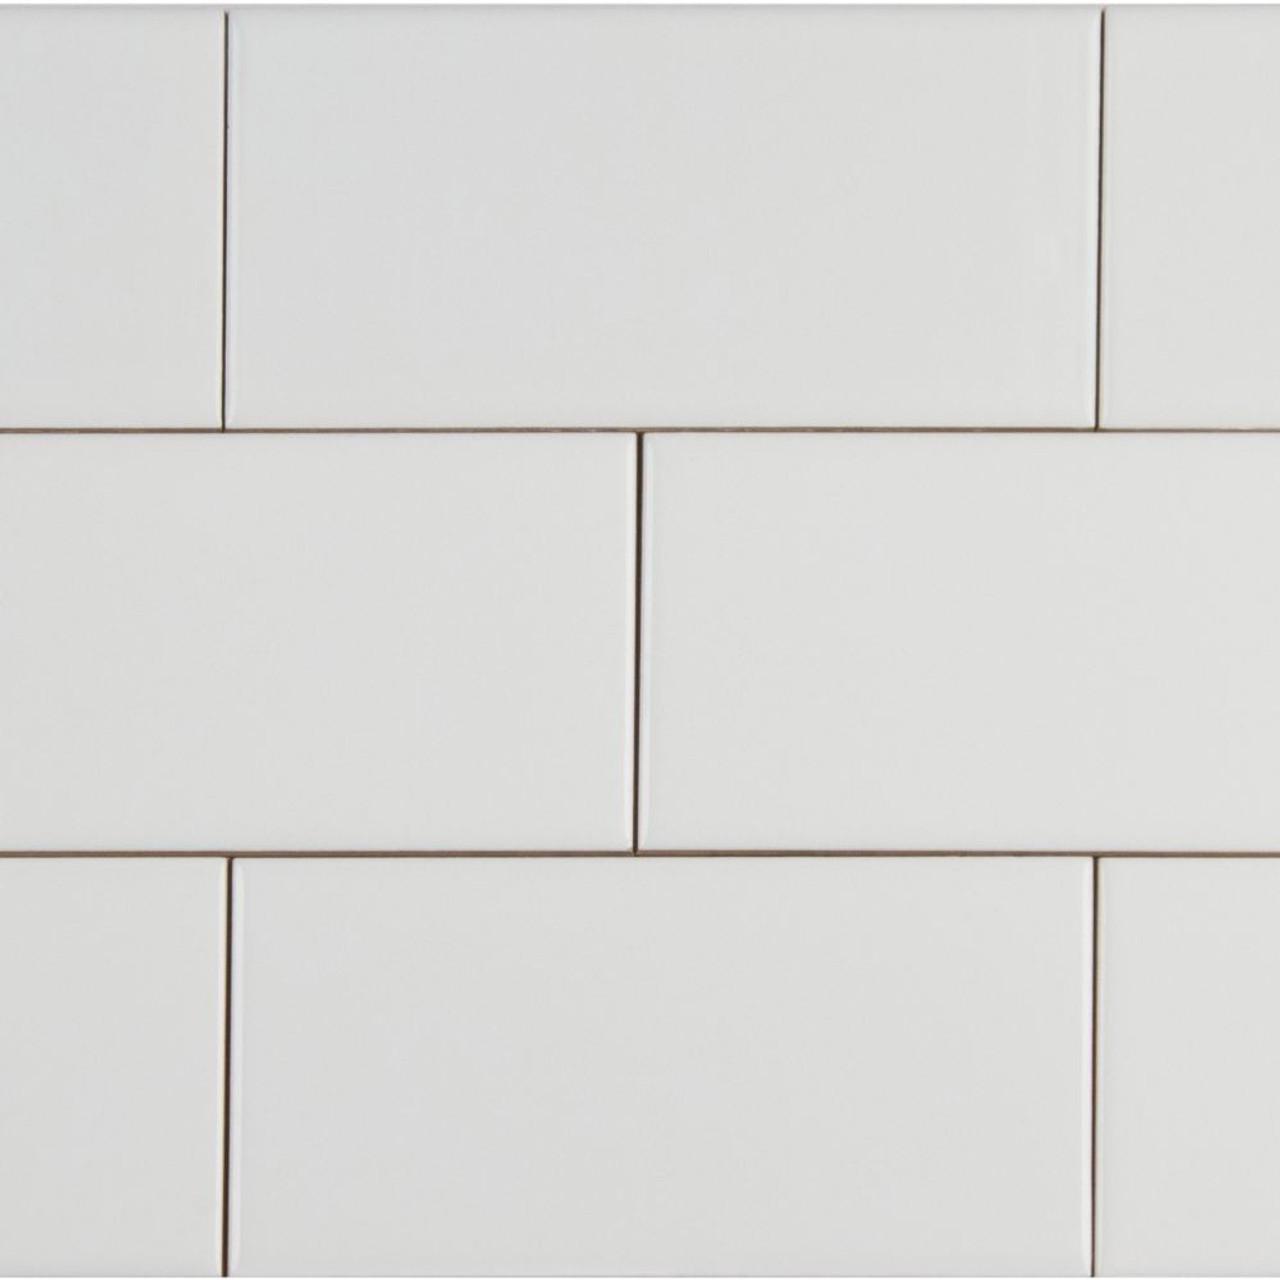 ms international backsplash series domino white 4x16 glossy subway tile nwhiglo4x16